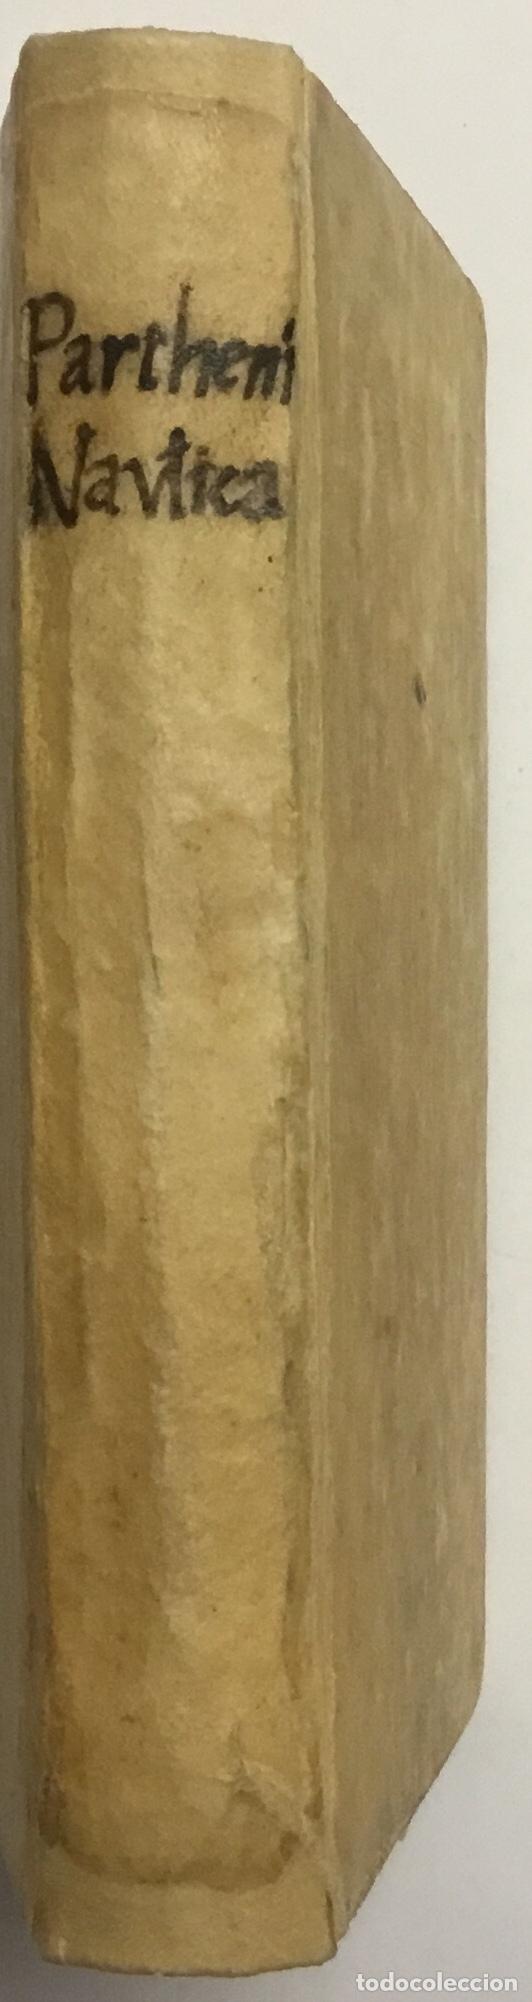 Libros antiguos: - Foto 10 - 112435487